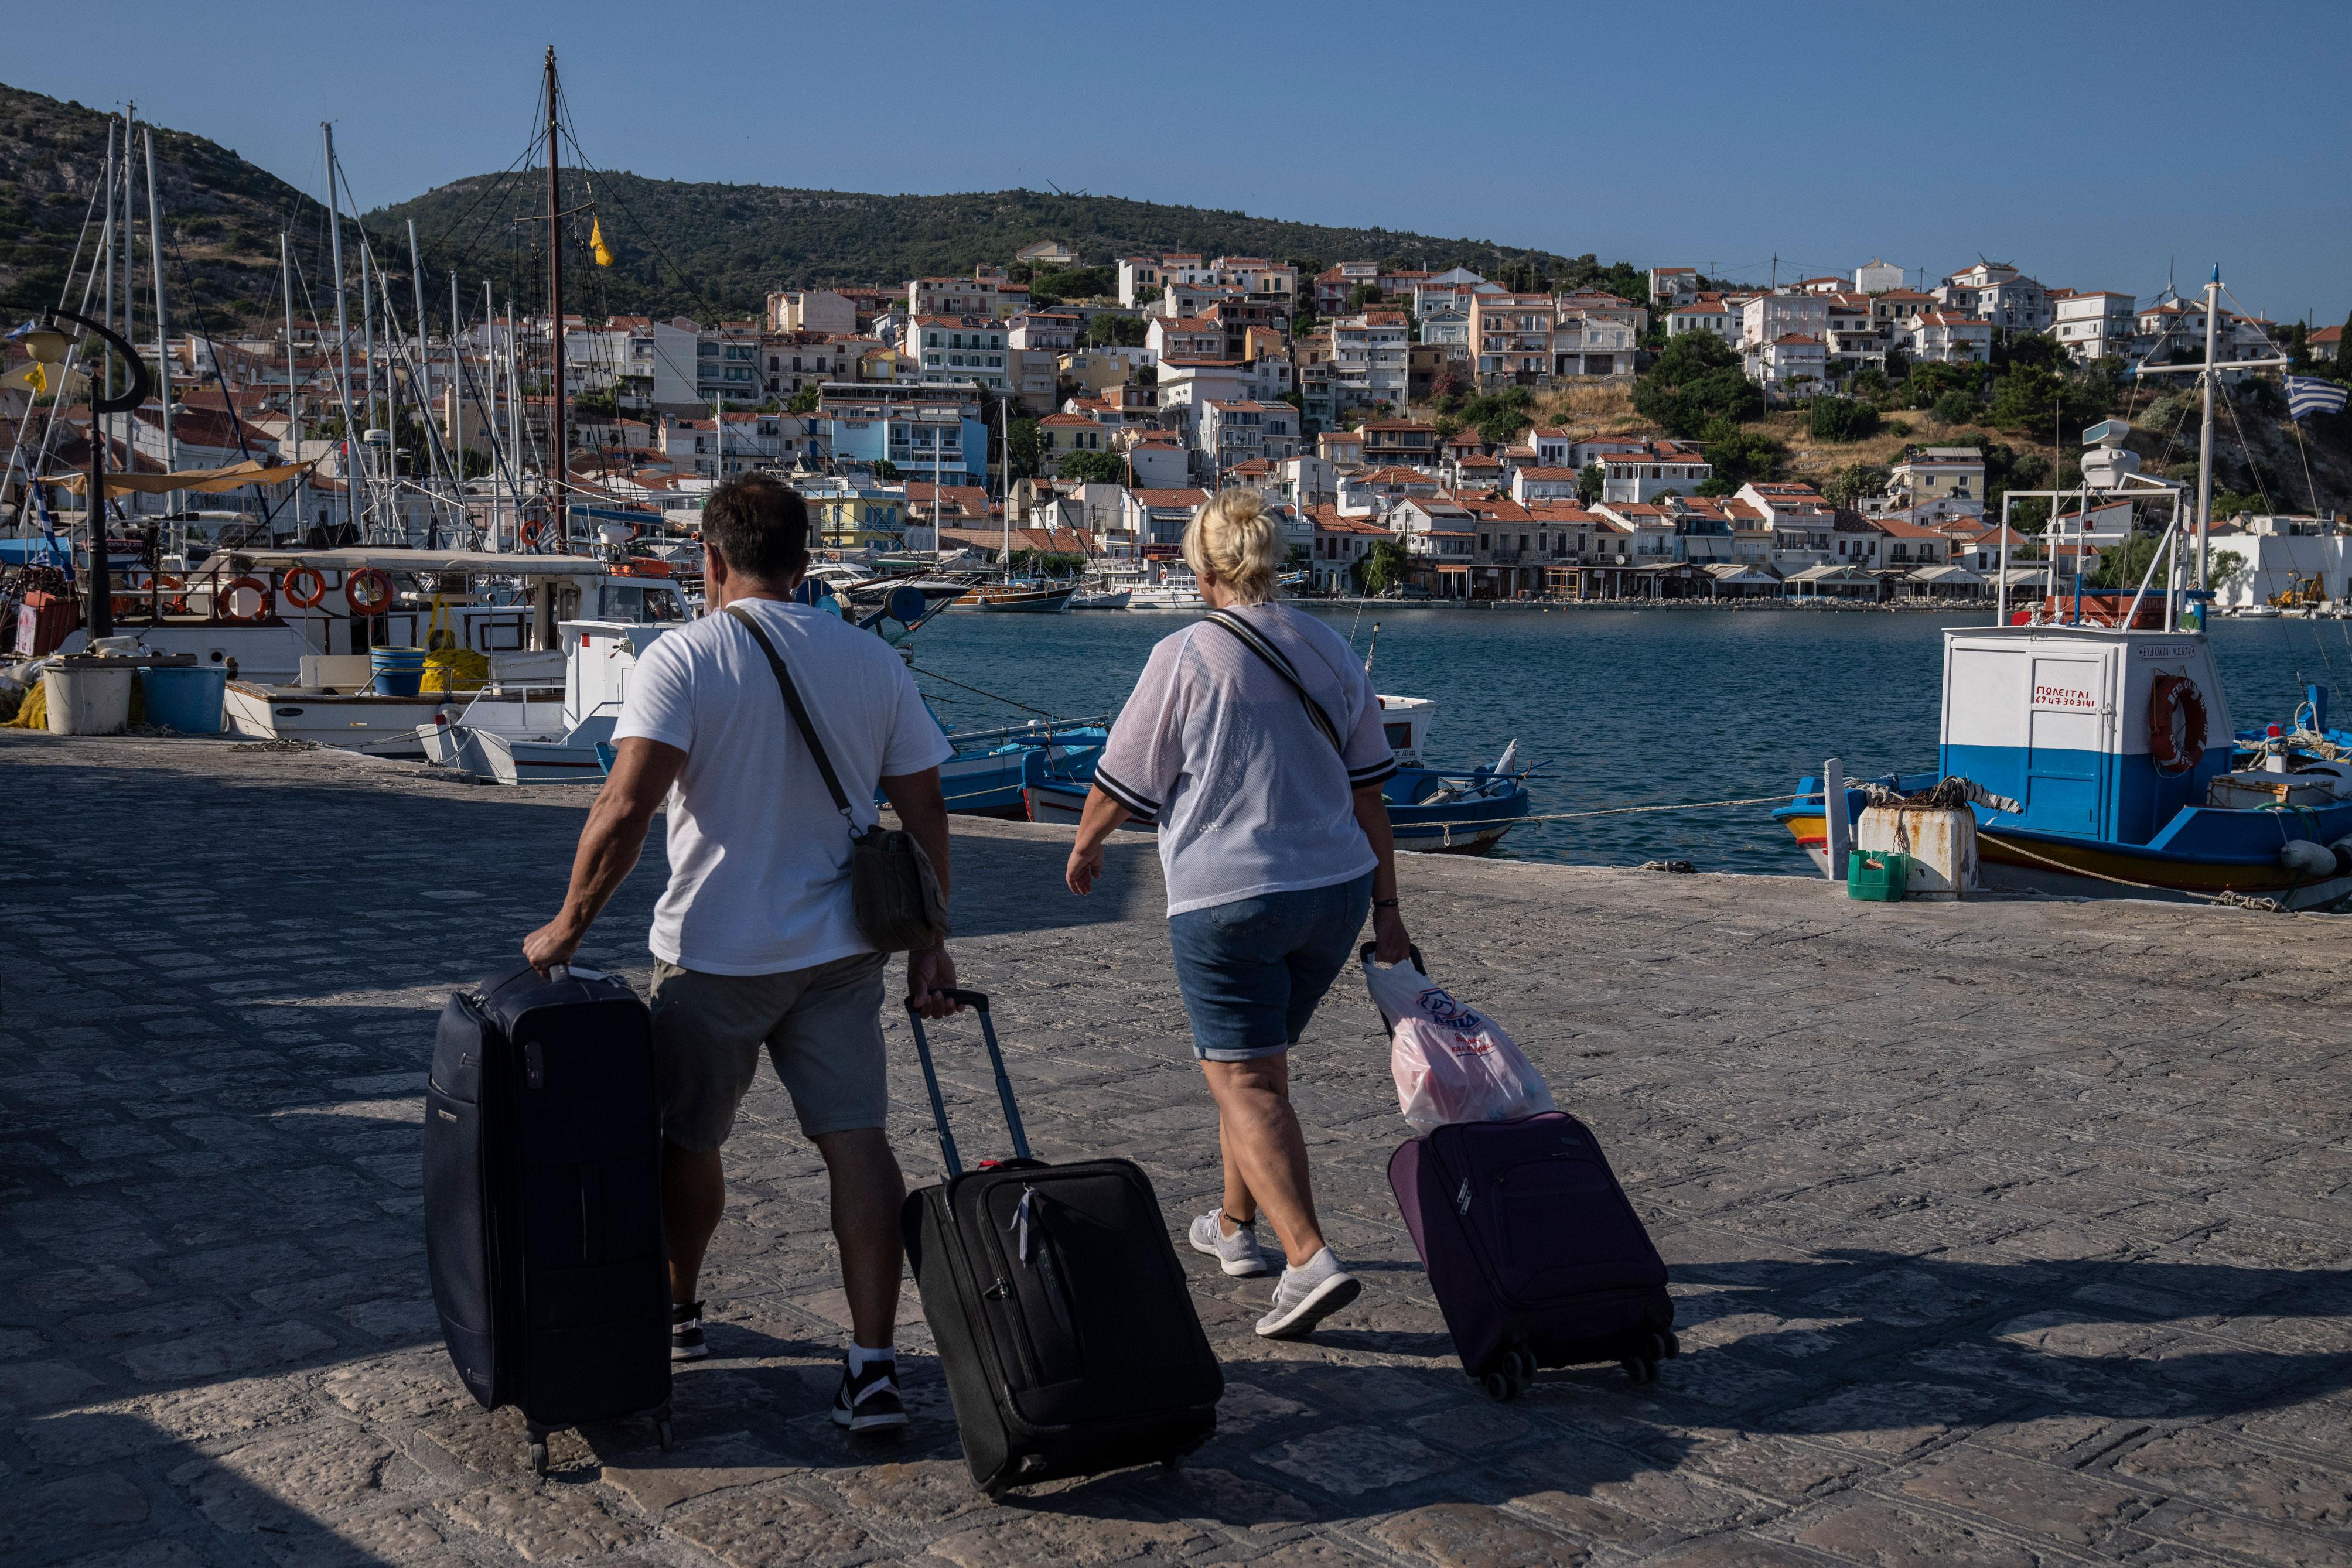 Travelers walk along the waterfront in Kokkari, on the eastern Aegean island of Samos, Greece, on Tuesday, June 8.